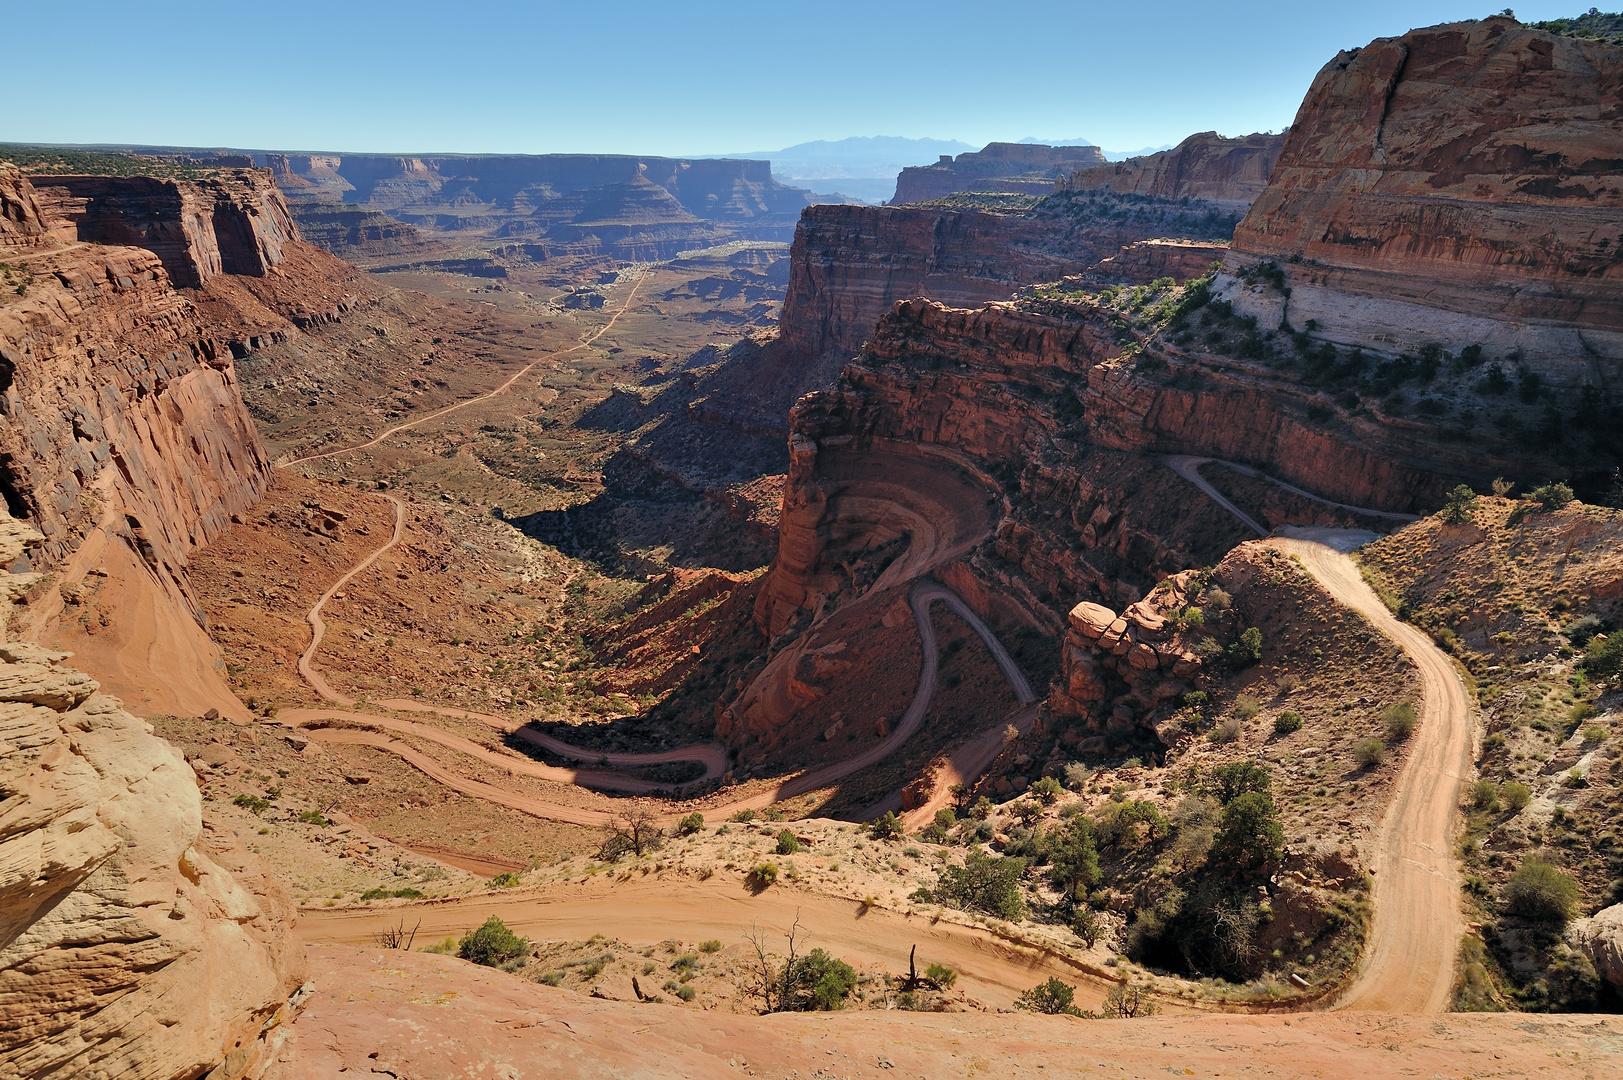 *Shafer Trail*